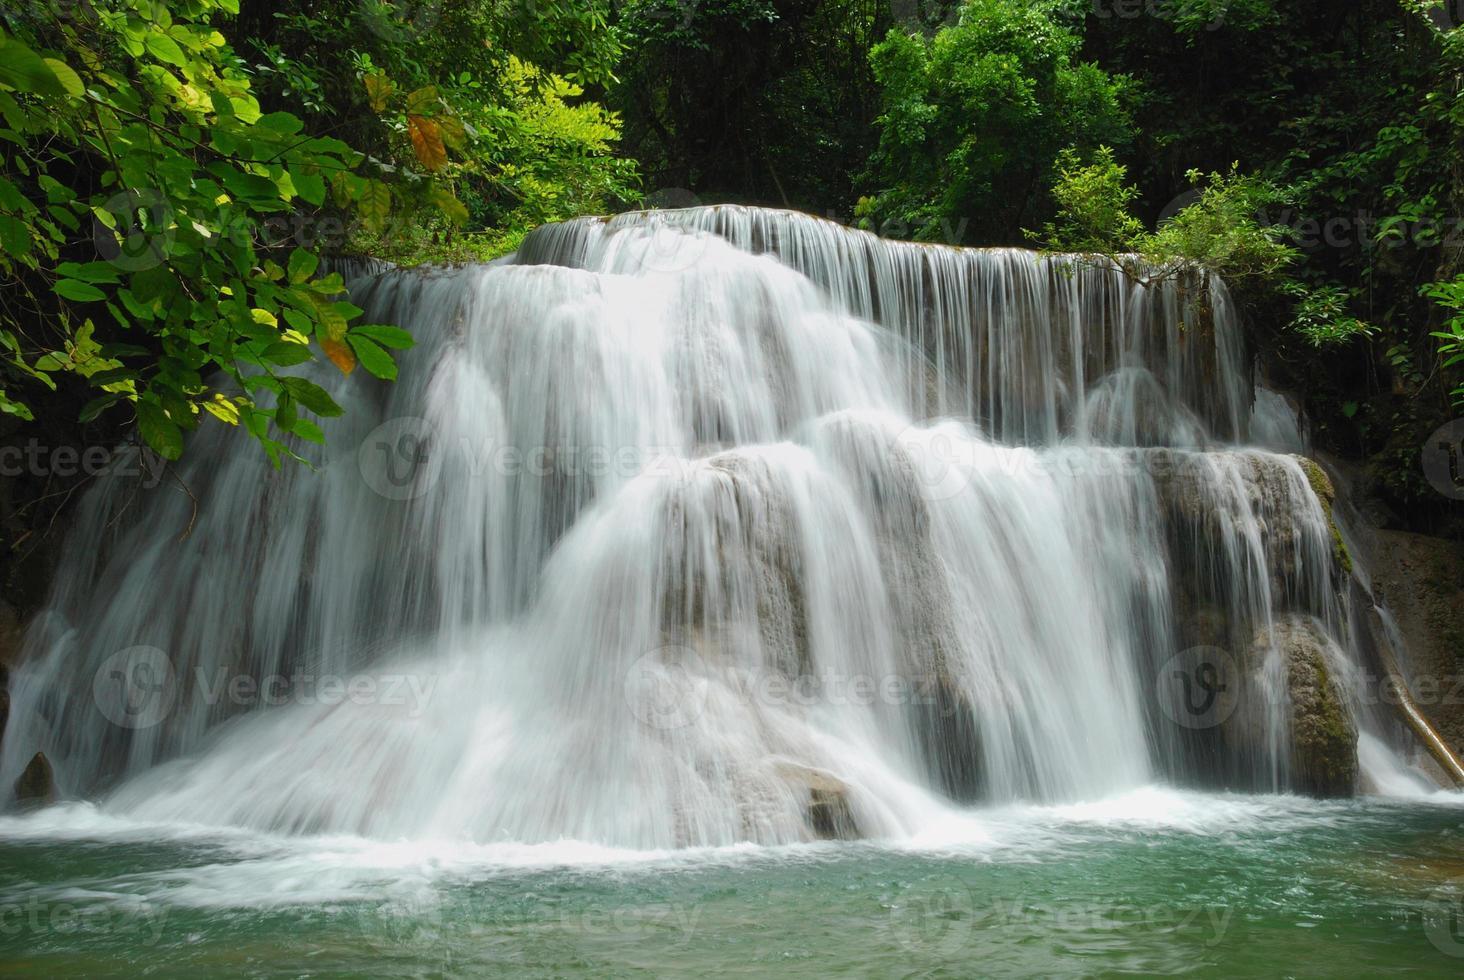 huay mae ka min waterfall in thailandia foto